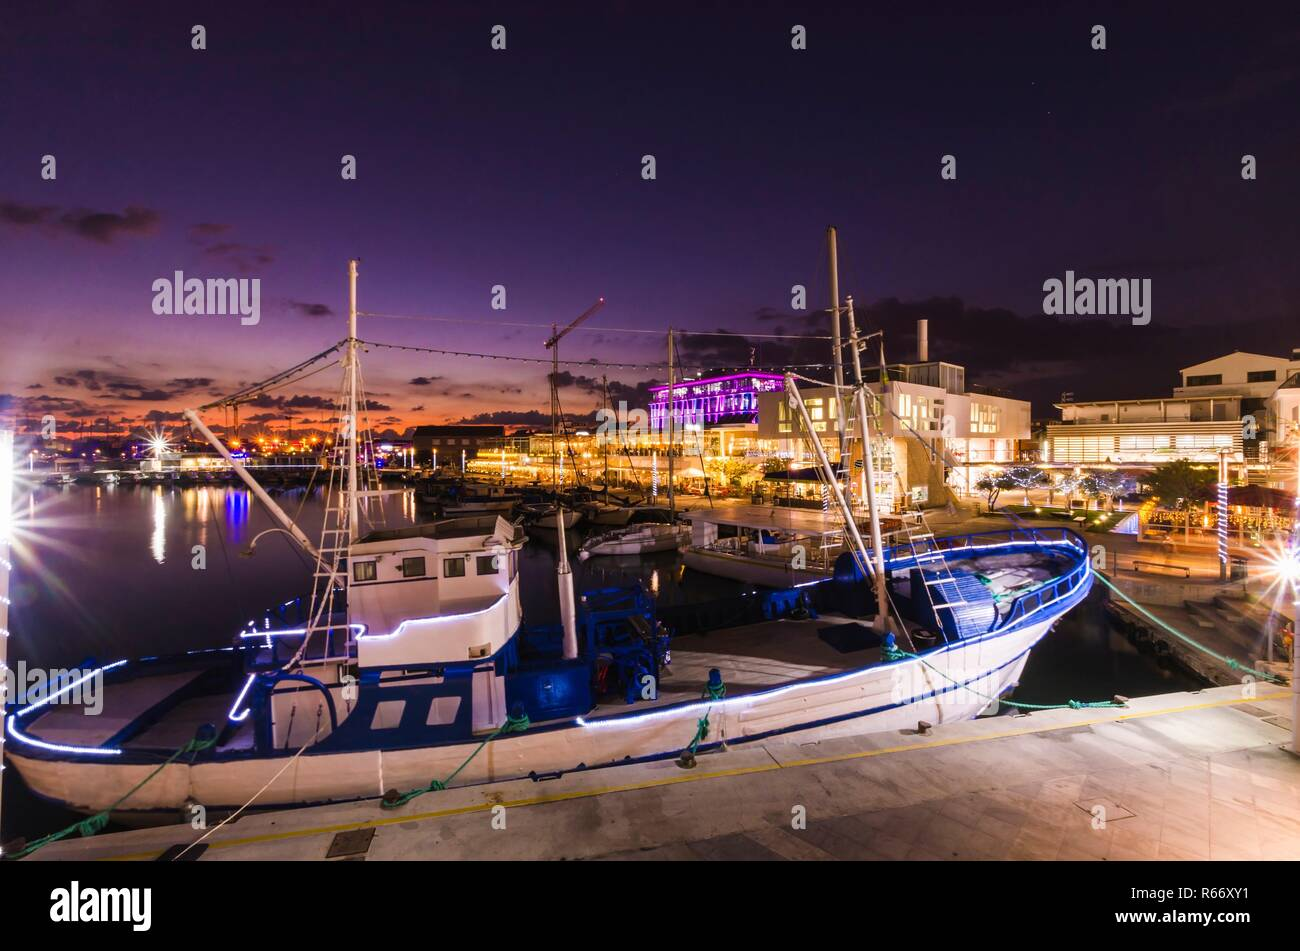 Old Port, Limassol, Cyprus - Stock Image